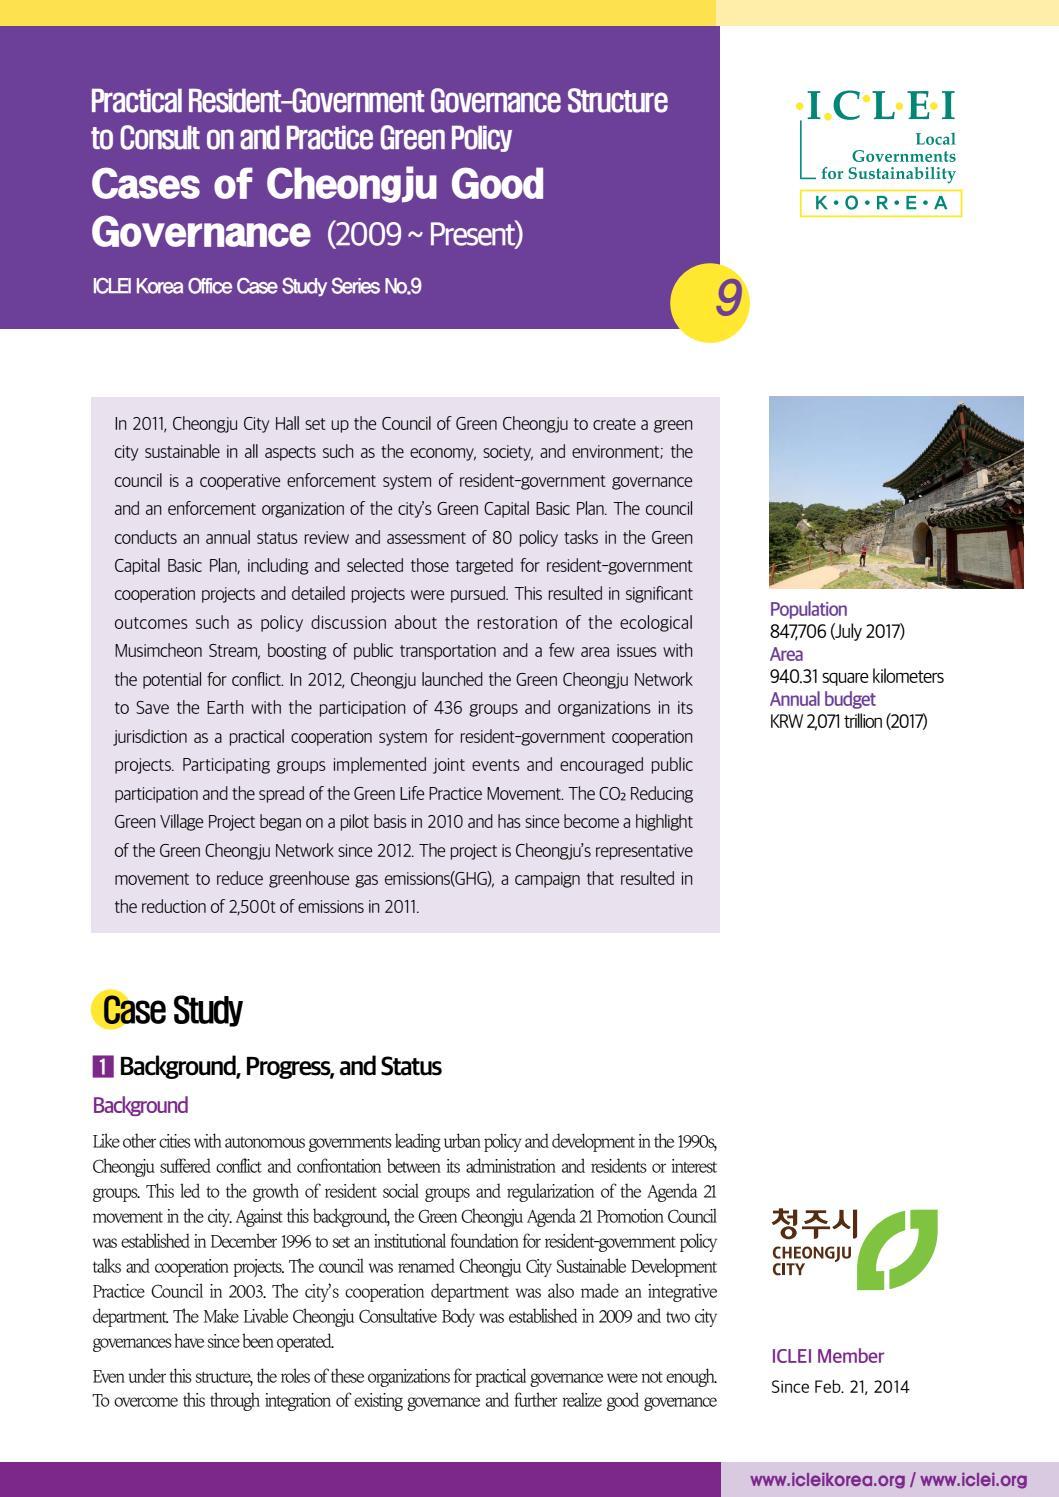 Iclei ko no 9 cheongju by ICLEI Korea Office - issuu